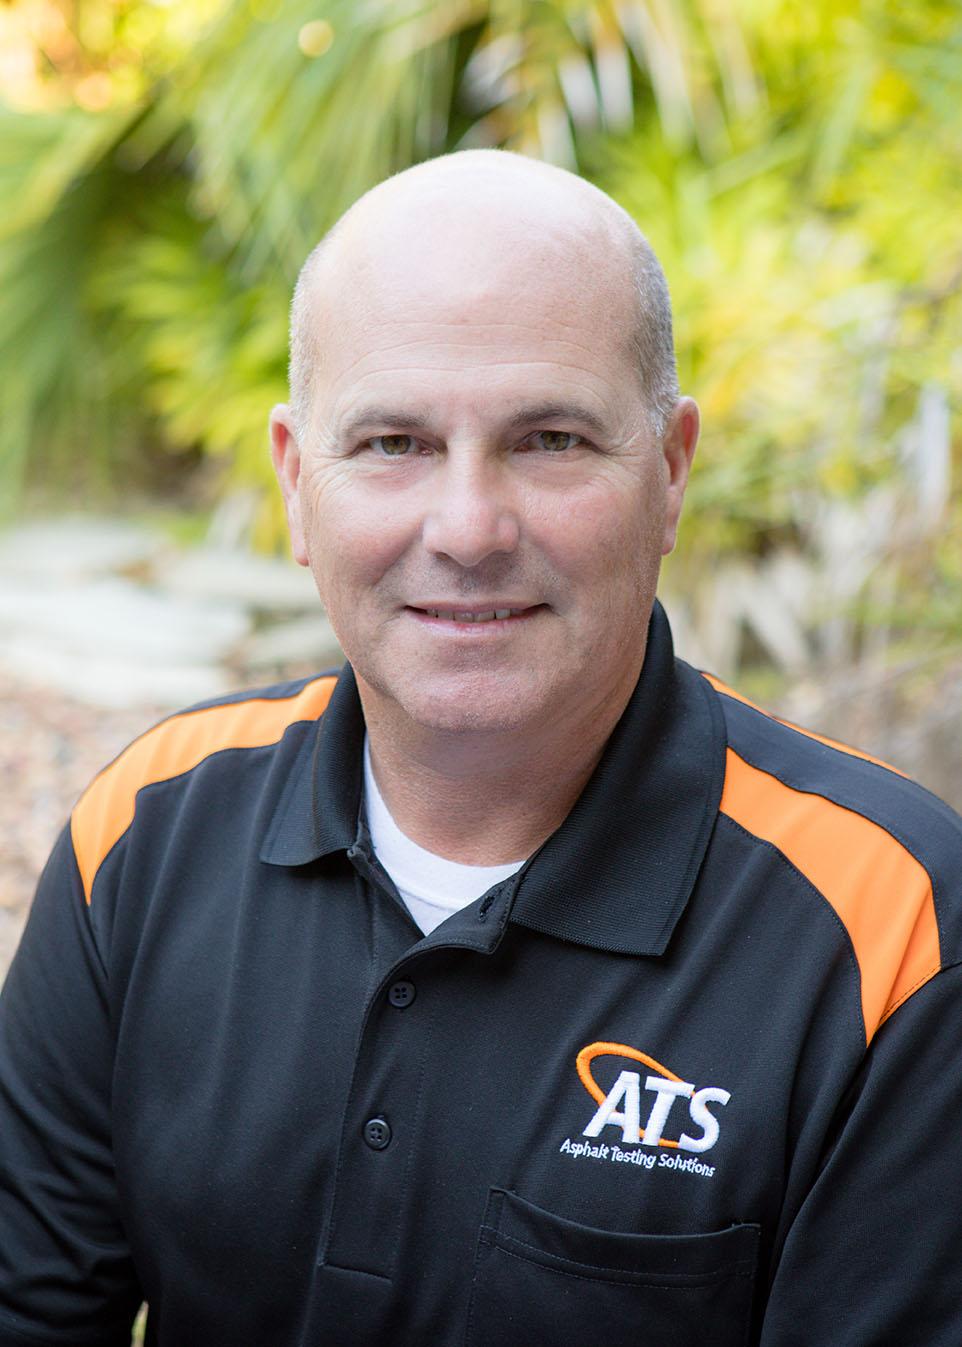 Steve McReynolds, ATS Director of Operations